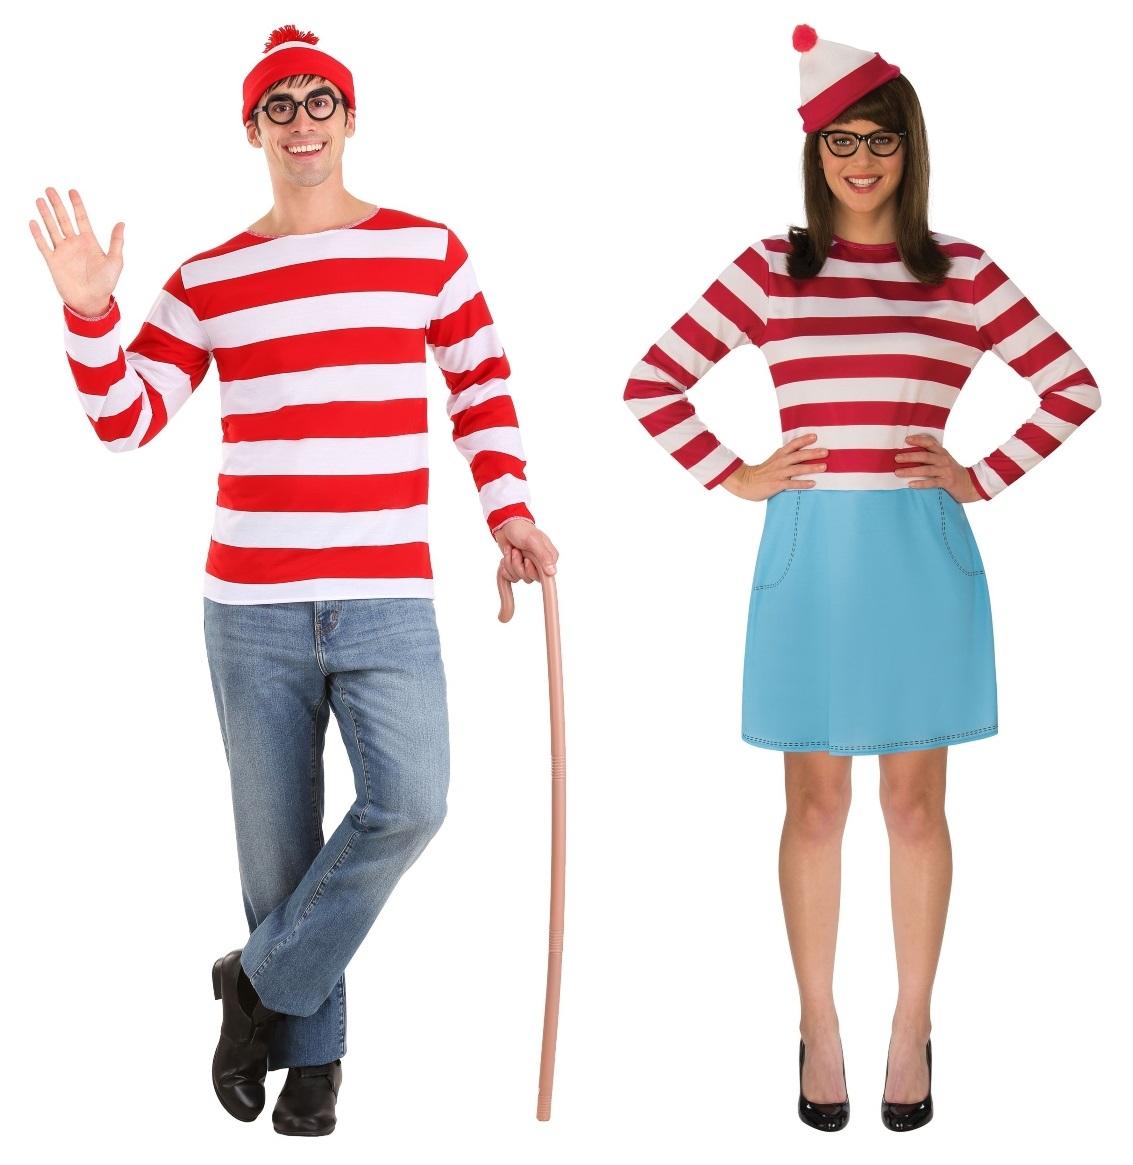 Waldo and Wenda Couples Costumes